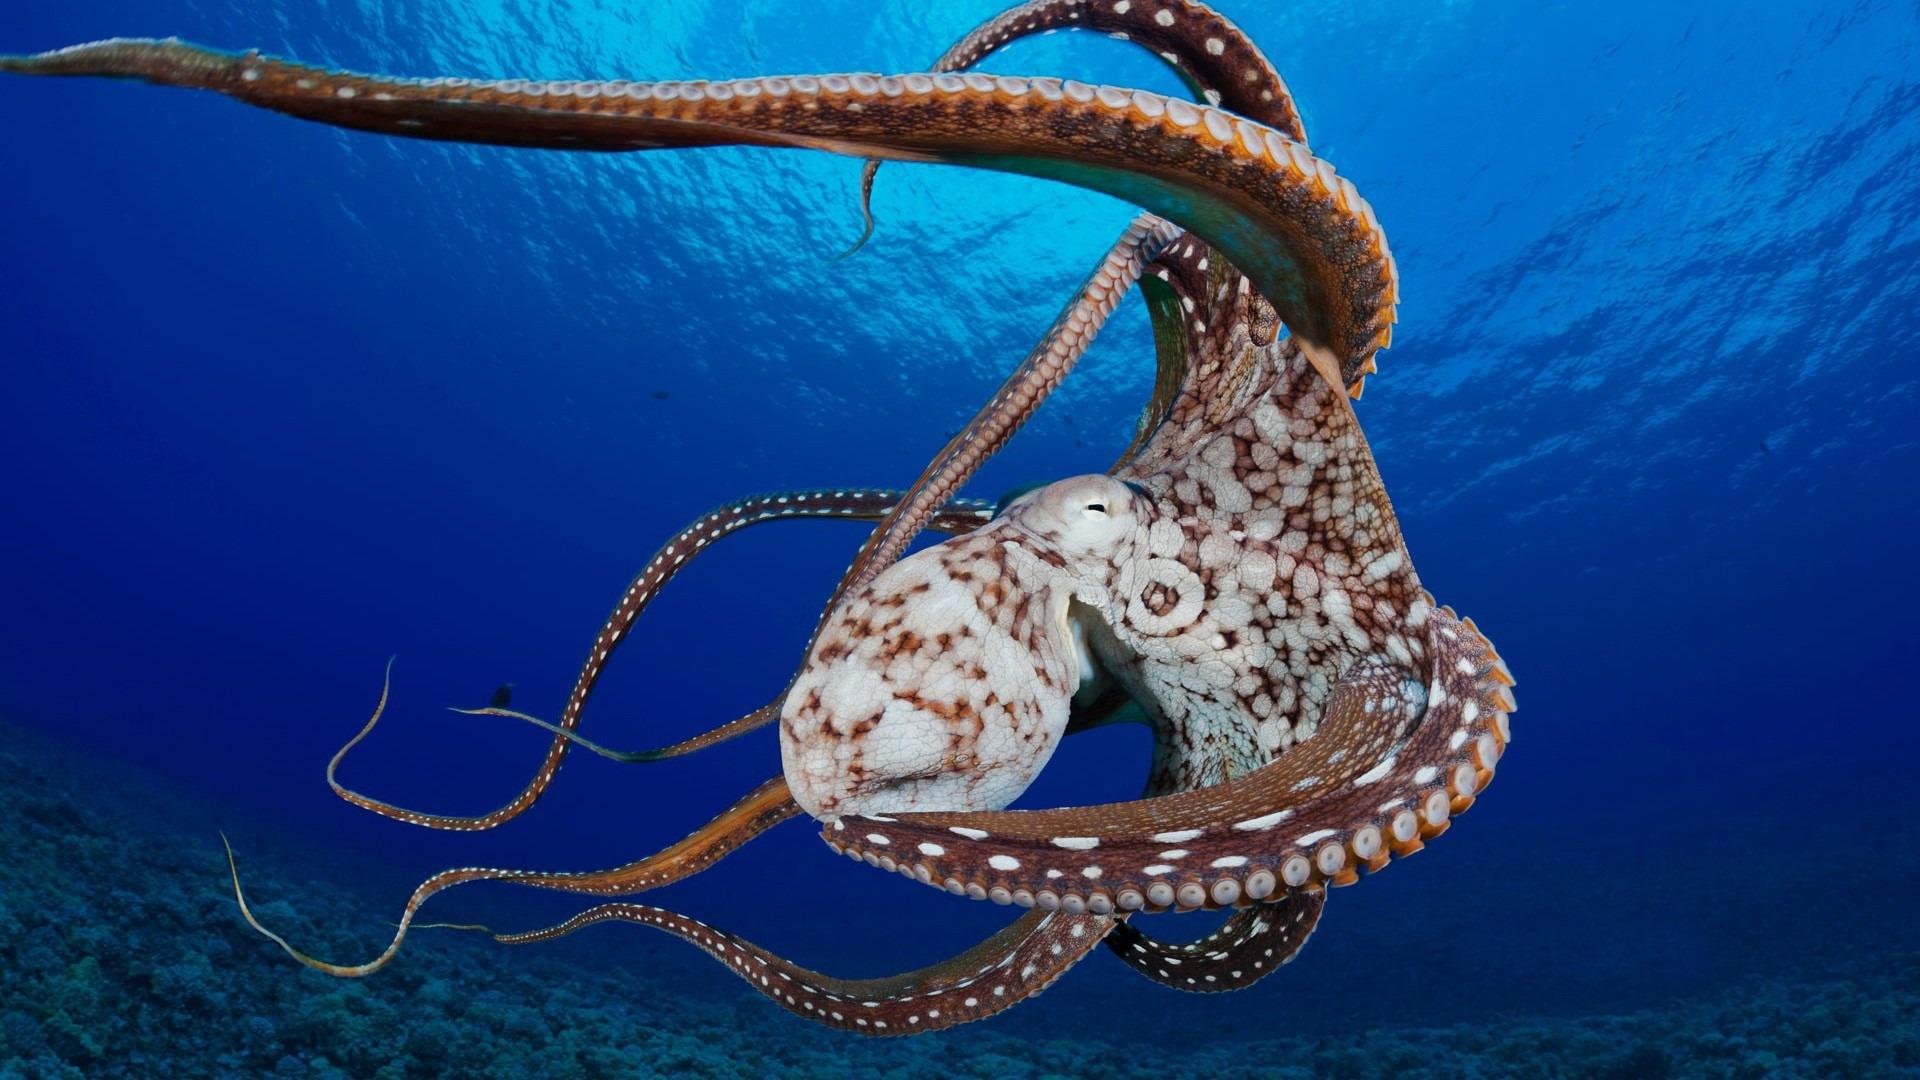 beautiful octopus wallpaper - photo #8